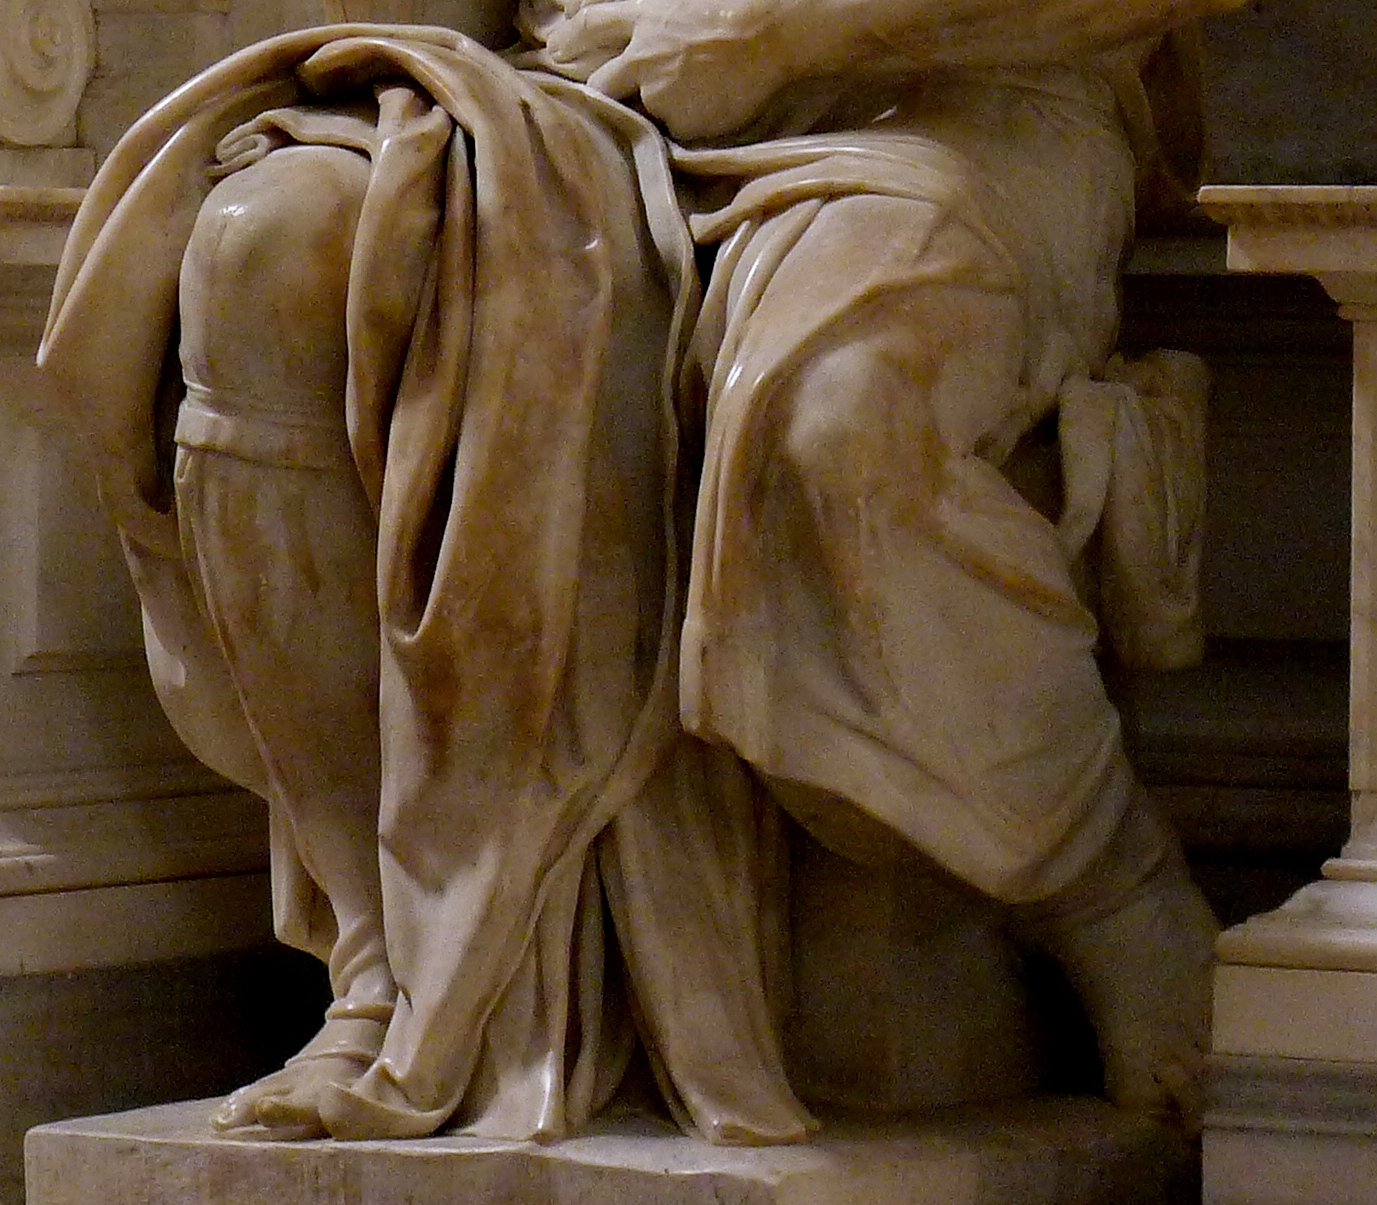 Michelangelo Buonarroti, Mosè, dettaglio delle gambe. Ph. Credit Jörg Bittner Unna